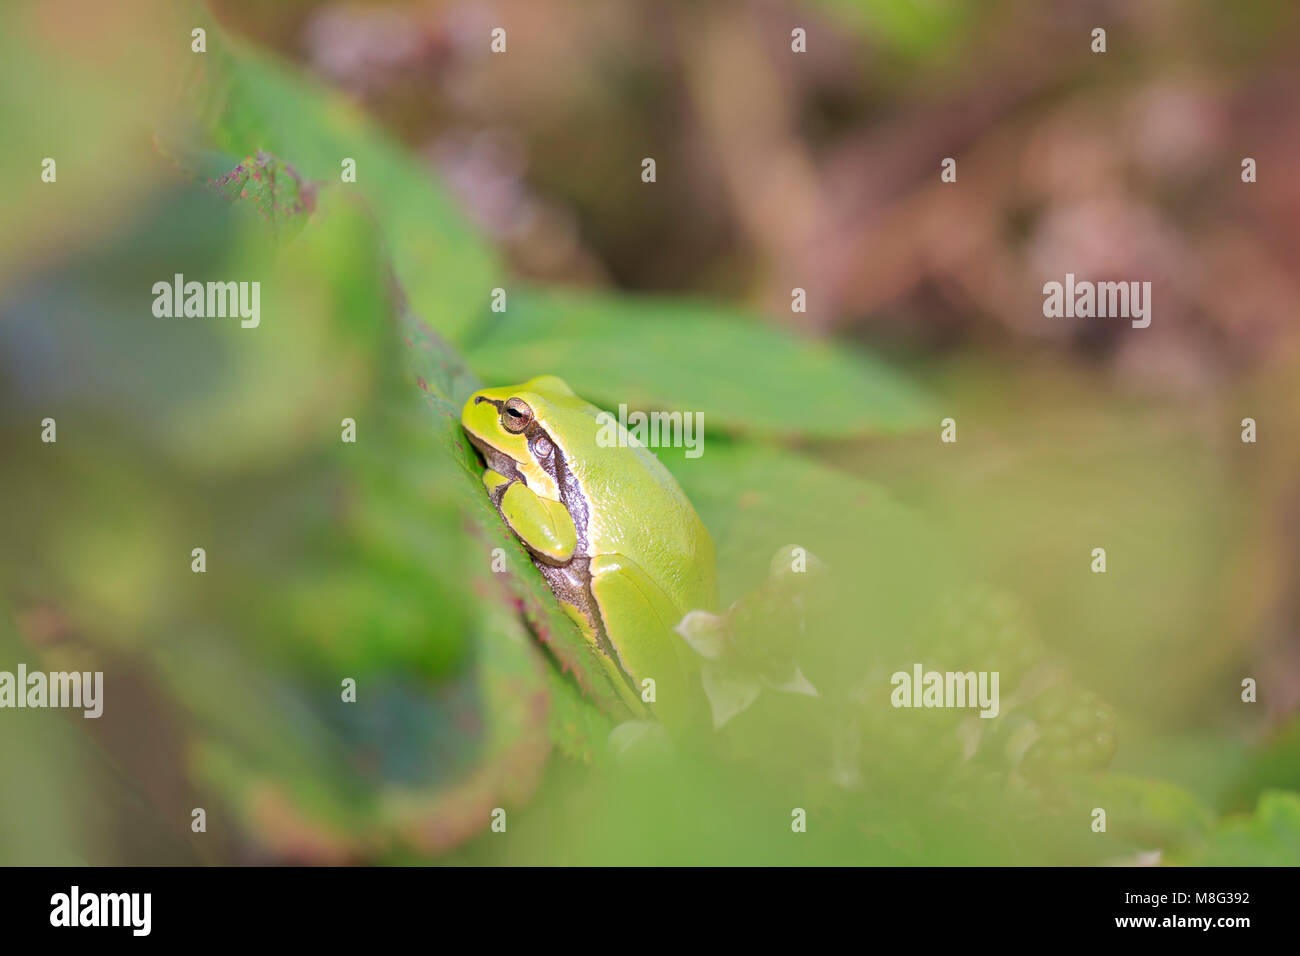 Closeup of a small European tree frog (Hyla arborea or Rana arborea), resting in a blackberry bush heating up in Stock Photo